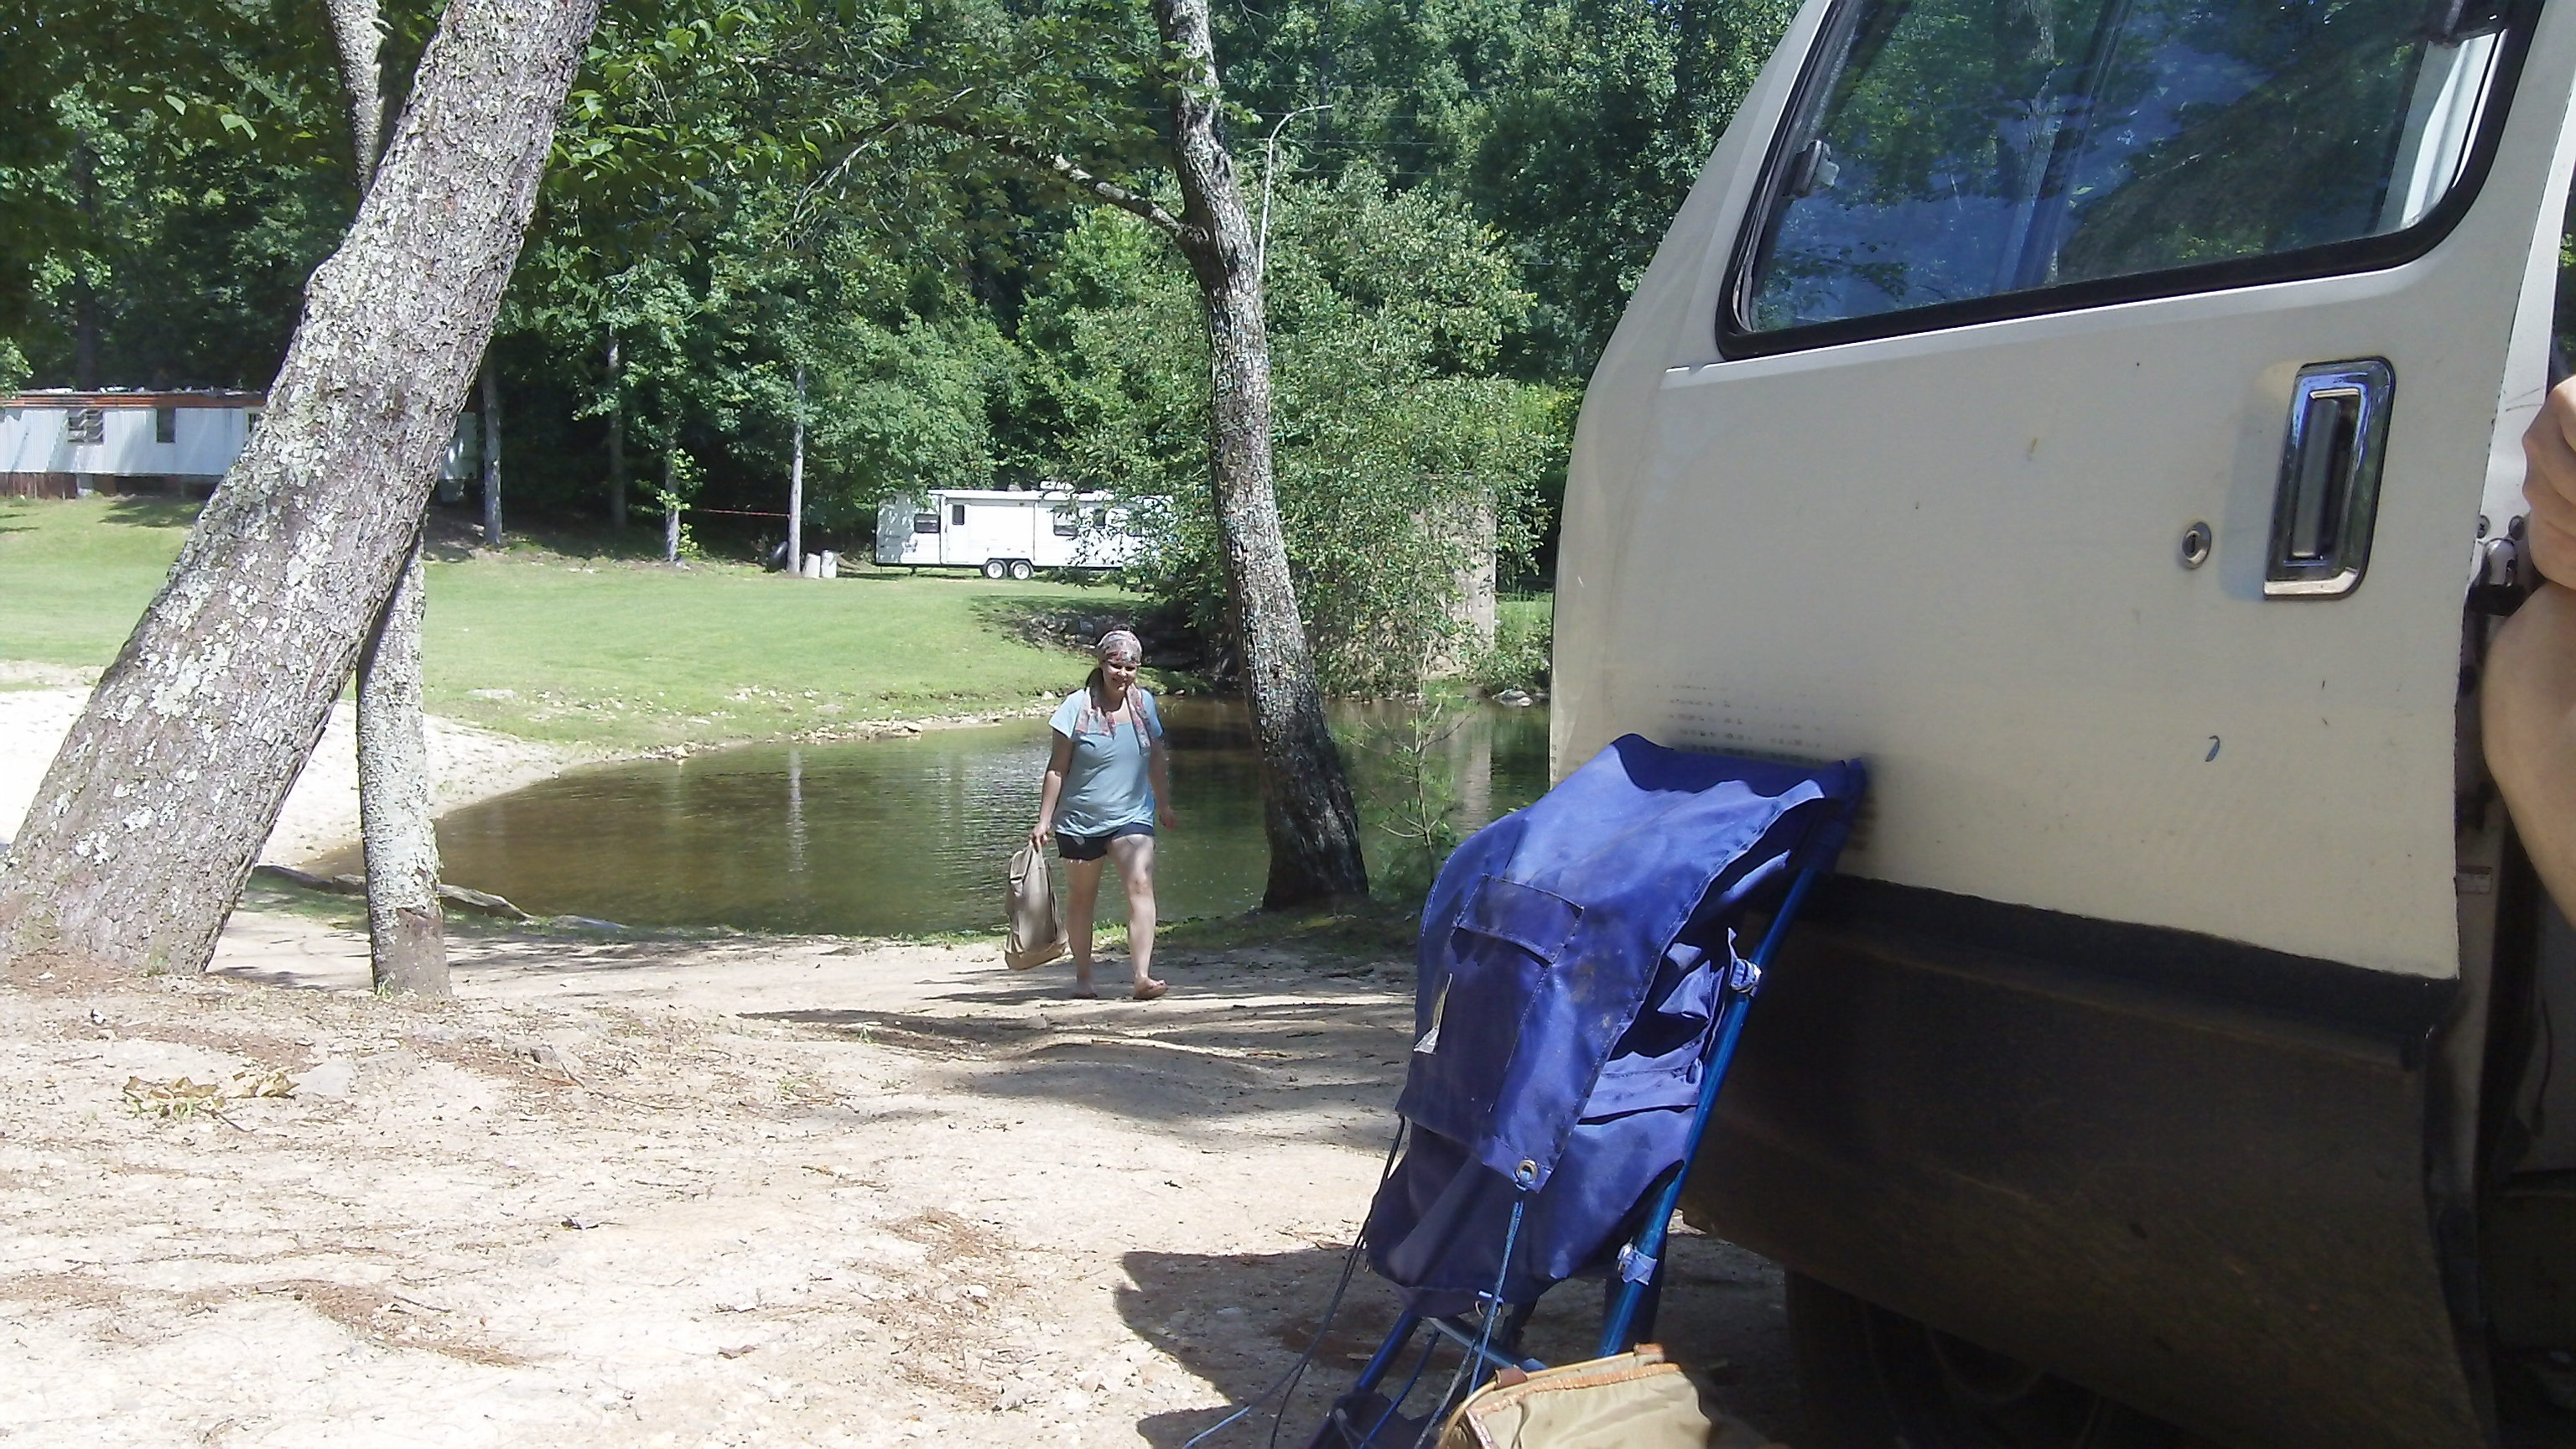 First camp site...